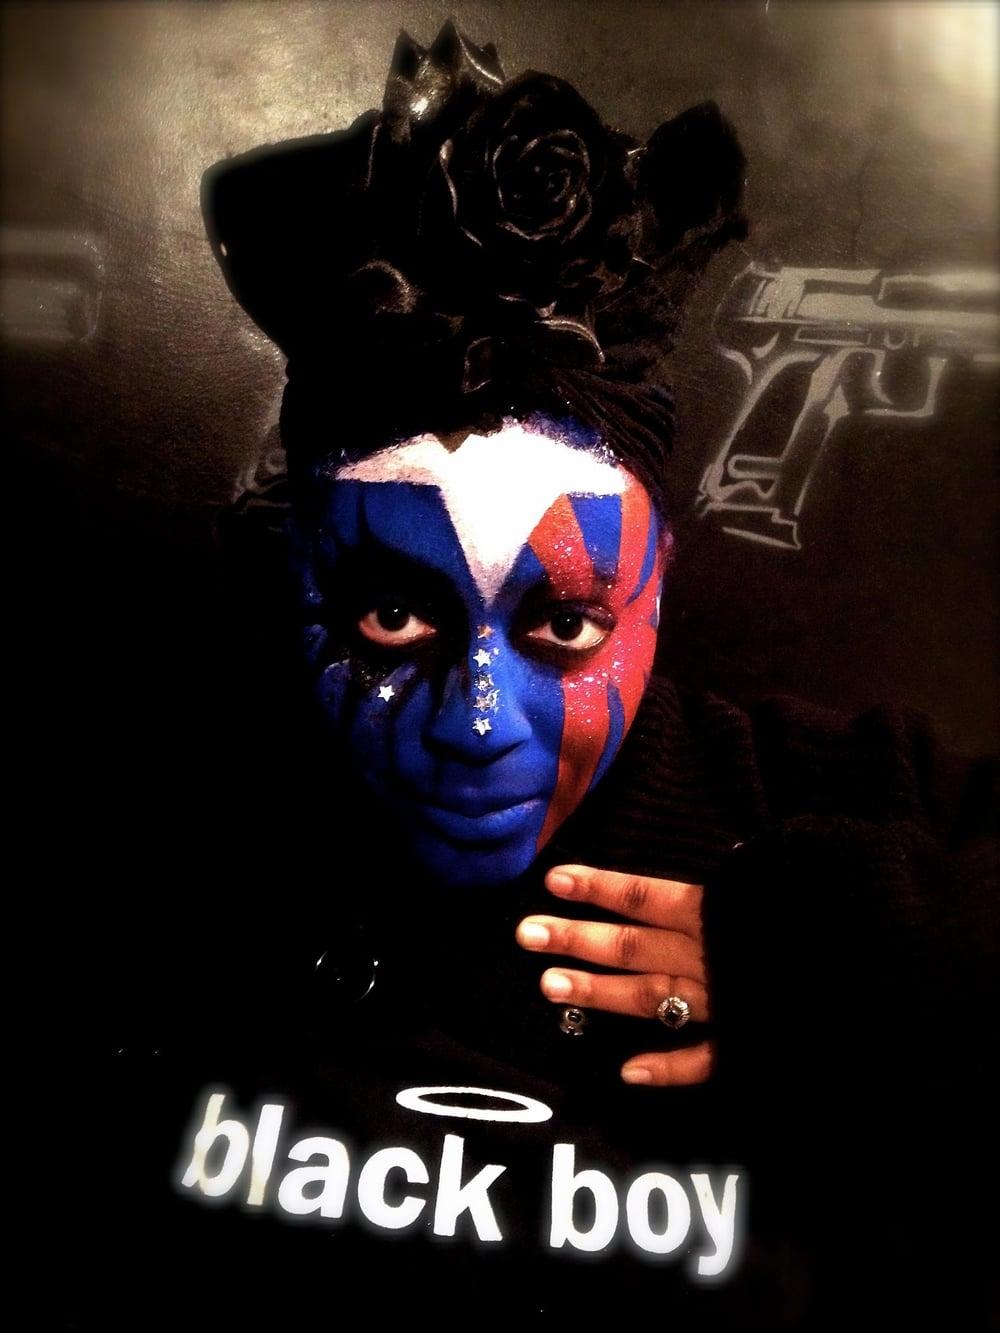 blackboy3.jpg